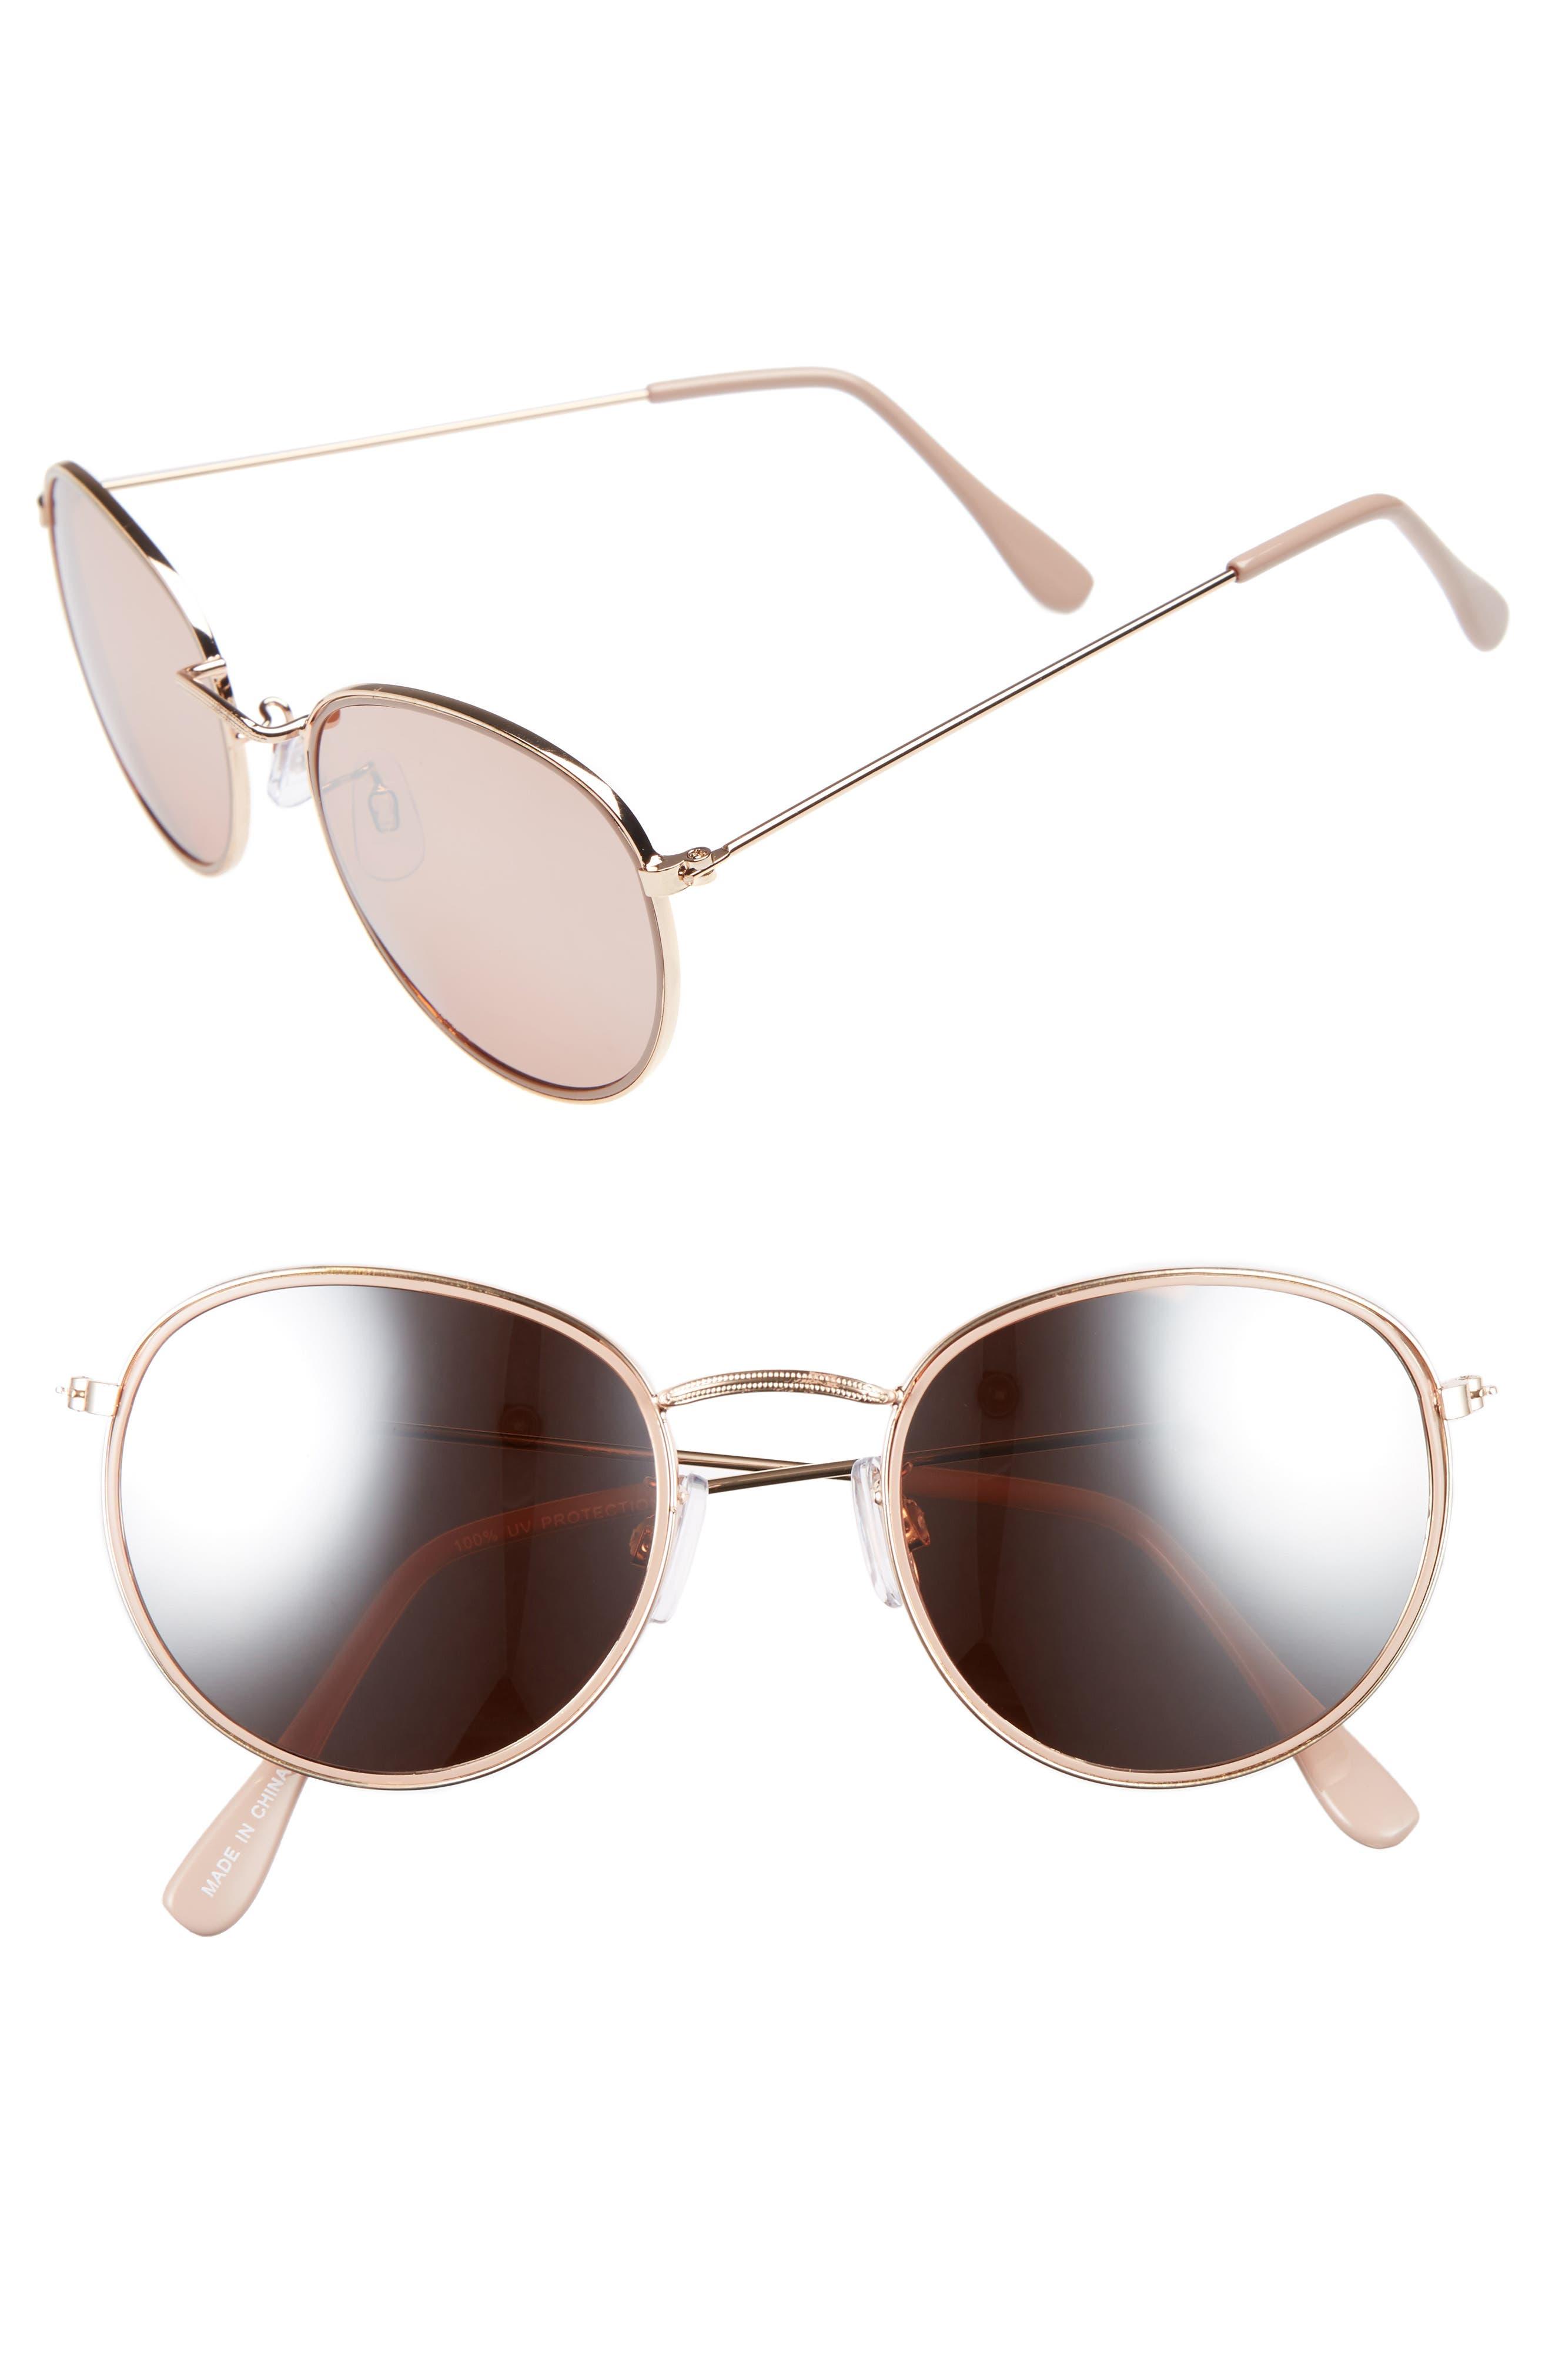 Alternate Image 1 Selected - BP. 50mm Round Aviator Sunglasses